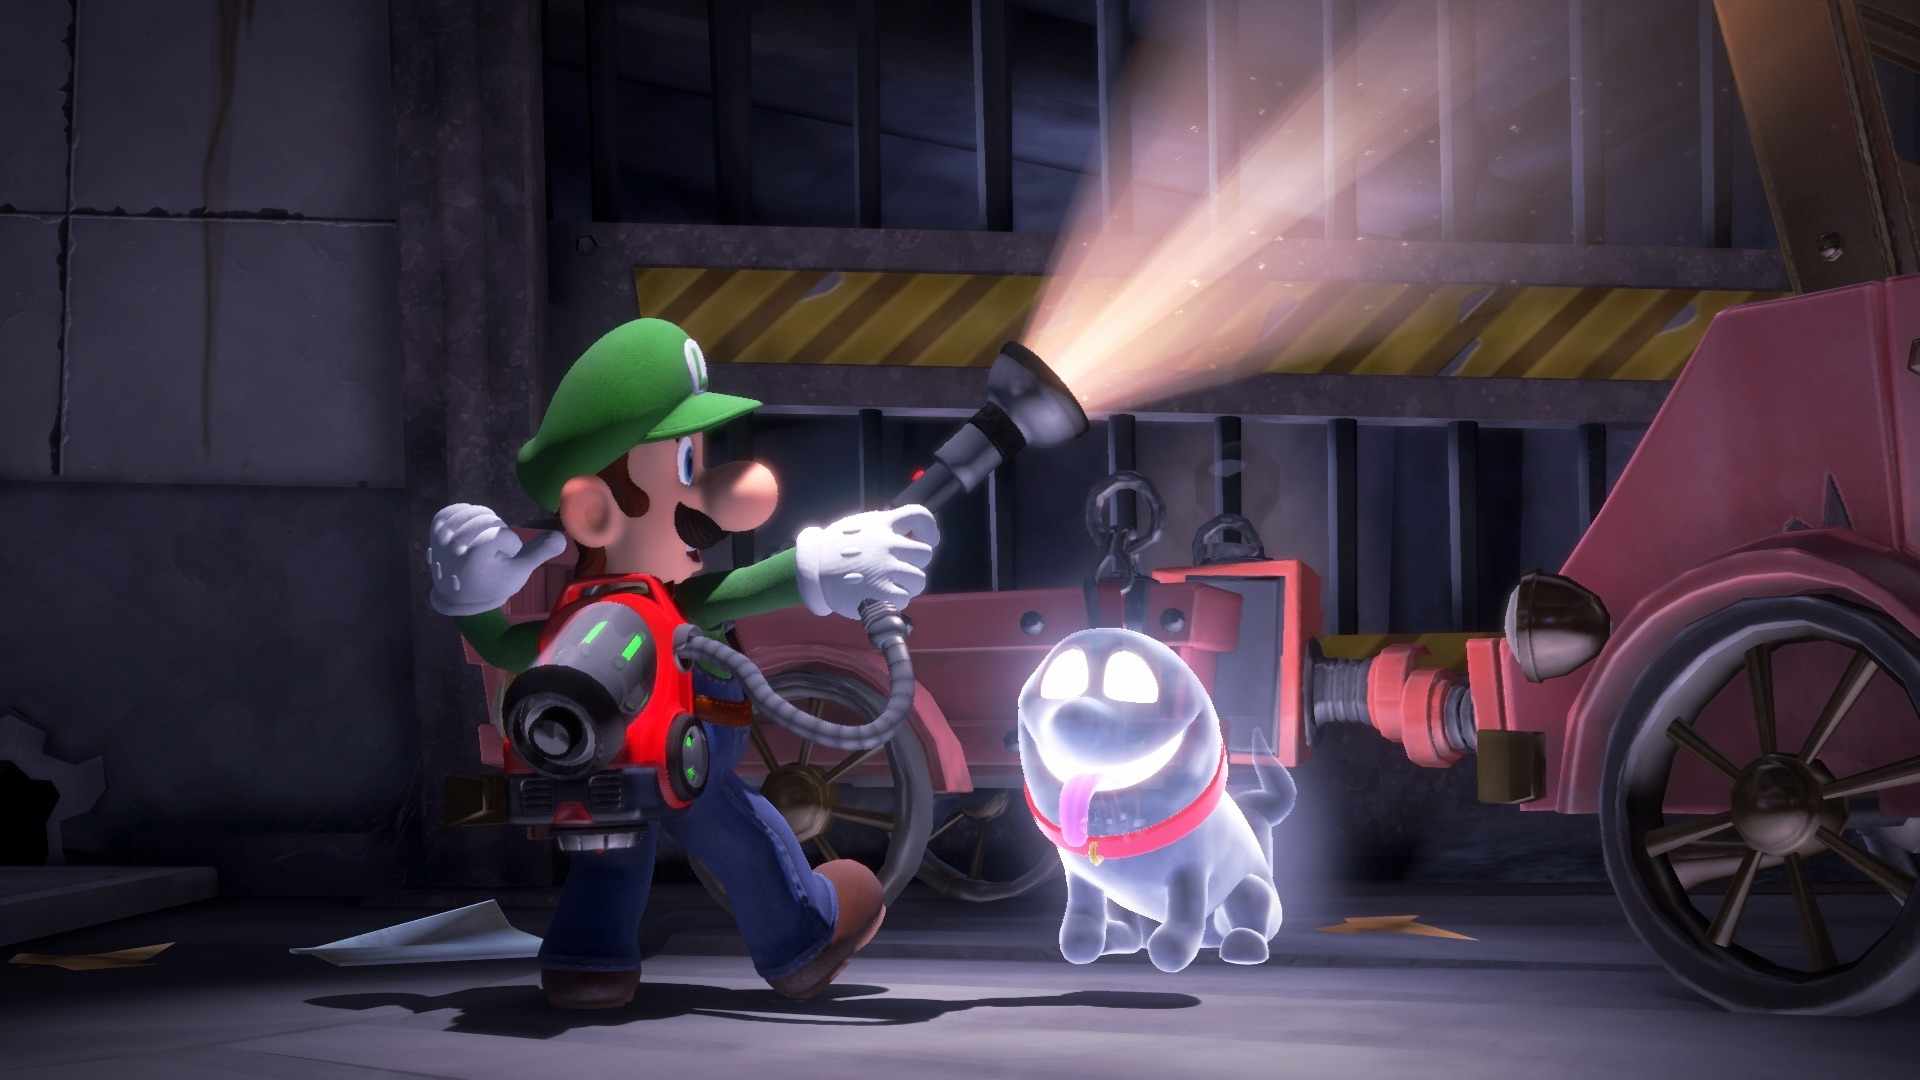 Luigi's Mansion 3 E3 2019 Screenshot 3